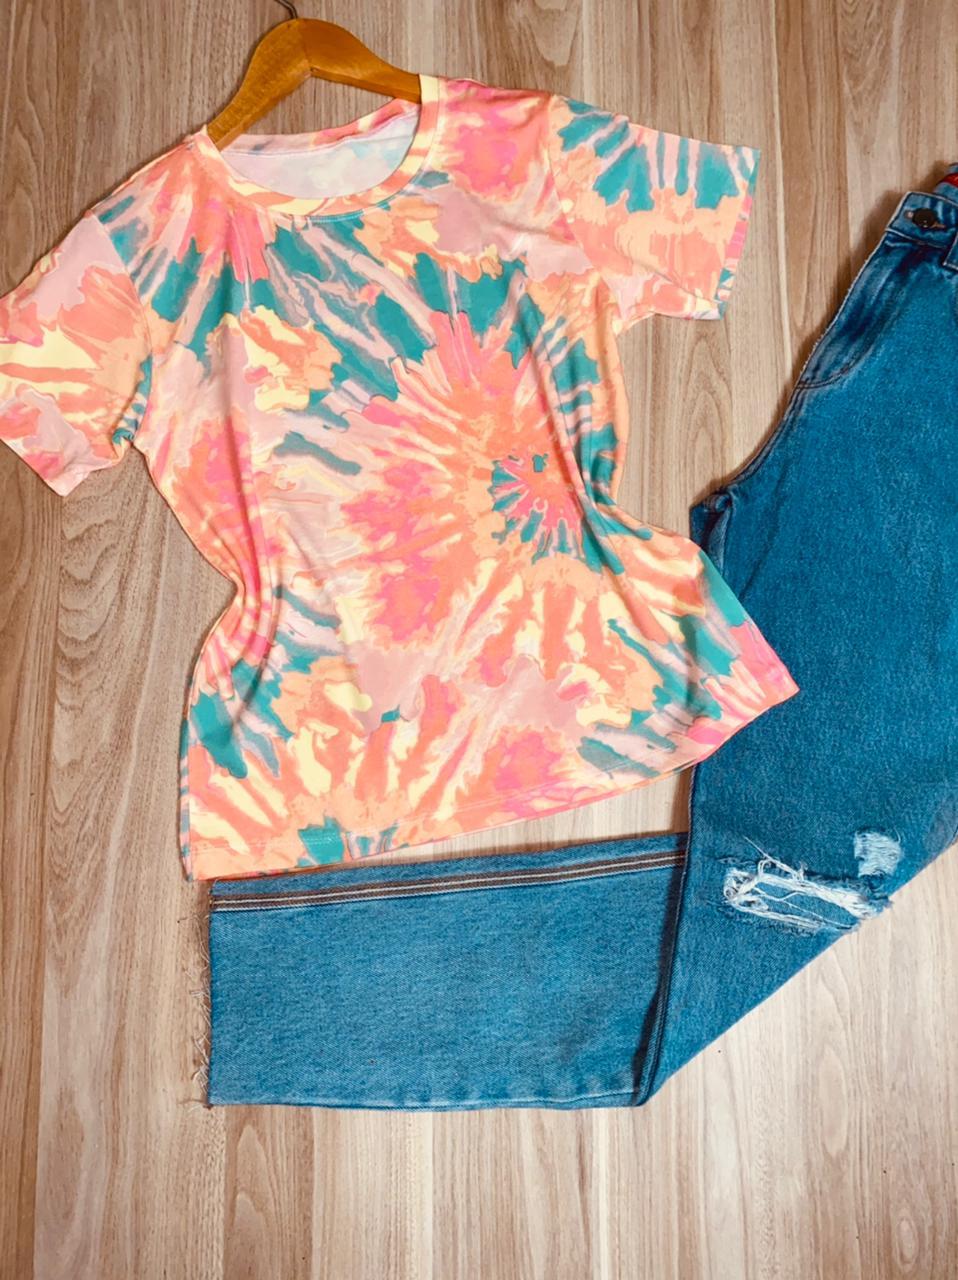 T-shirt Podrinha Tie Dye Top